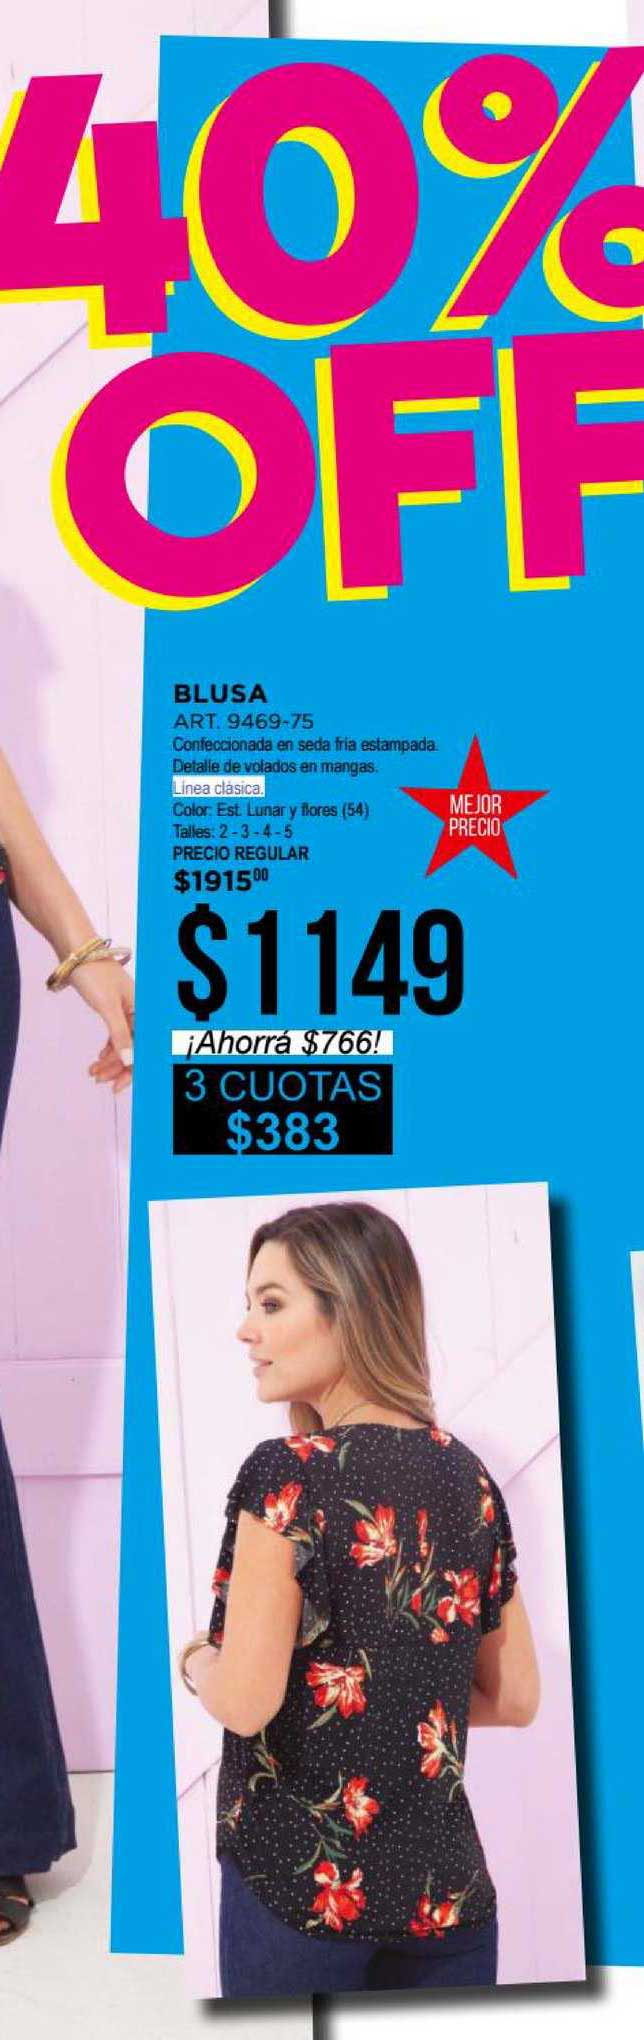 Juana Bonita Blusa ART. 9469-75